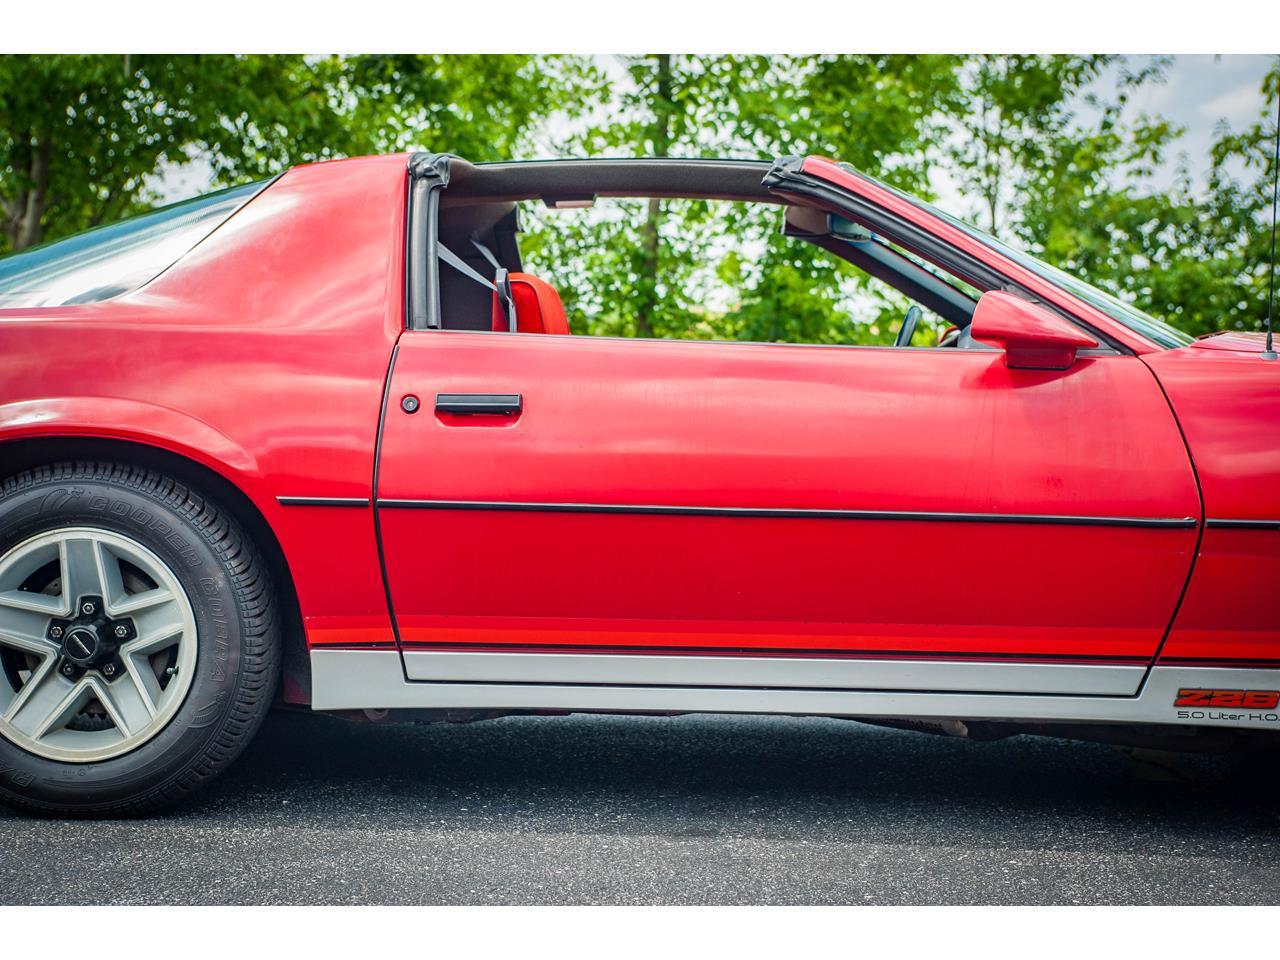 Large Picture of '84 Camaro located in Illinois - $9,500.00 - QB9Y